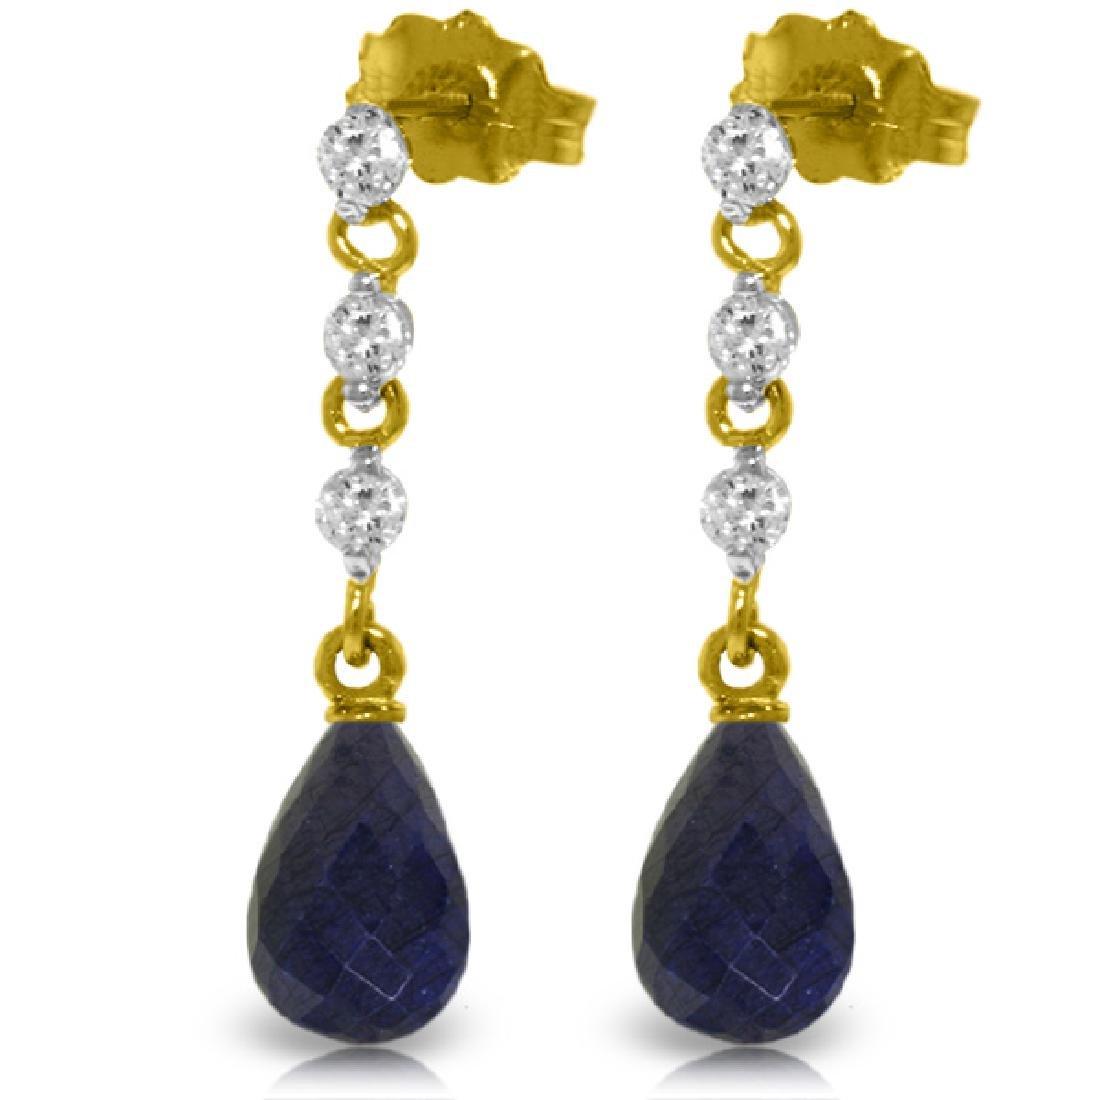 Genuine 6.9 ctw Sapphire & Diamond Earrings Jewelry